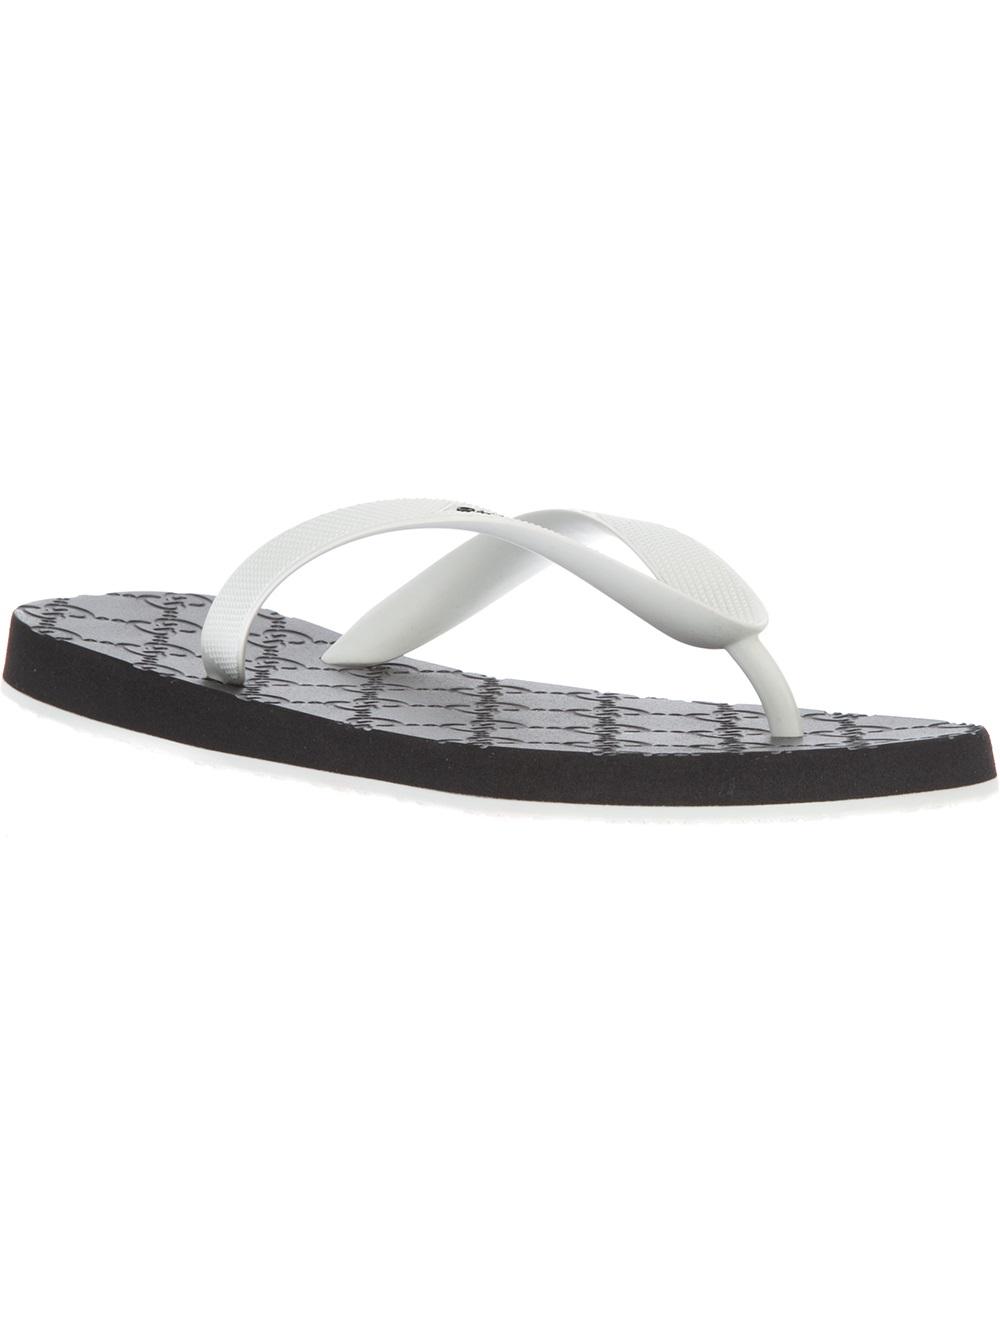 Gucci Bedlam Flip Flop In Black  Lyst-3024